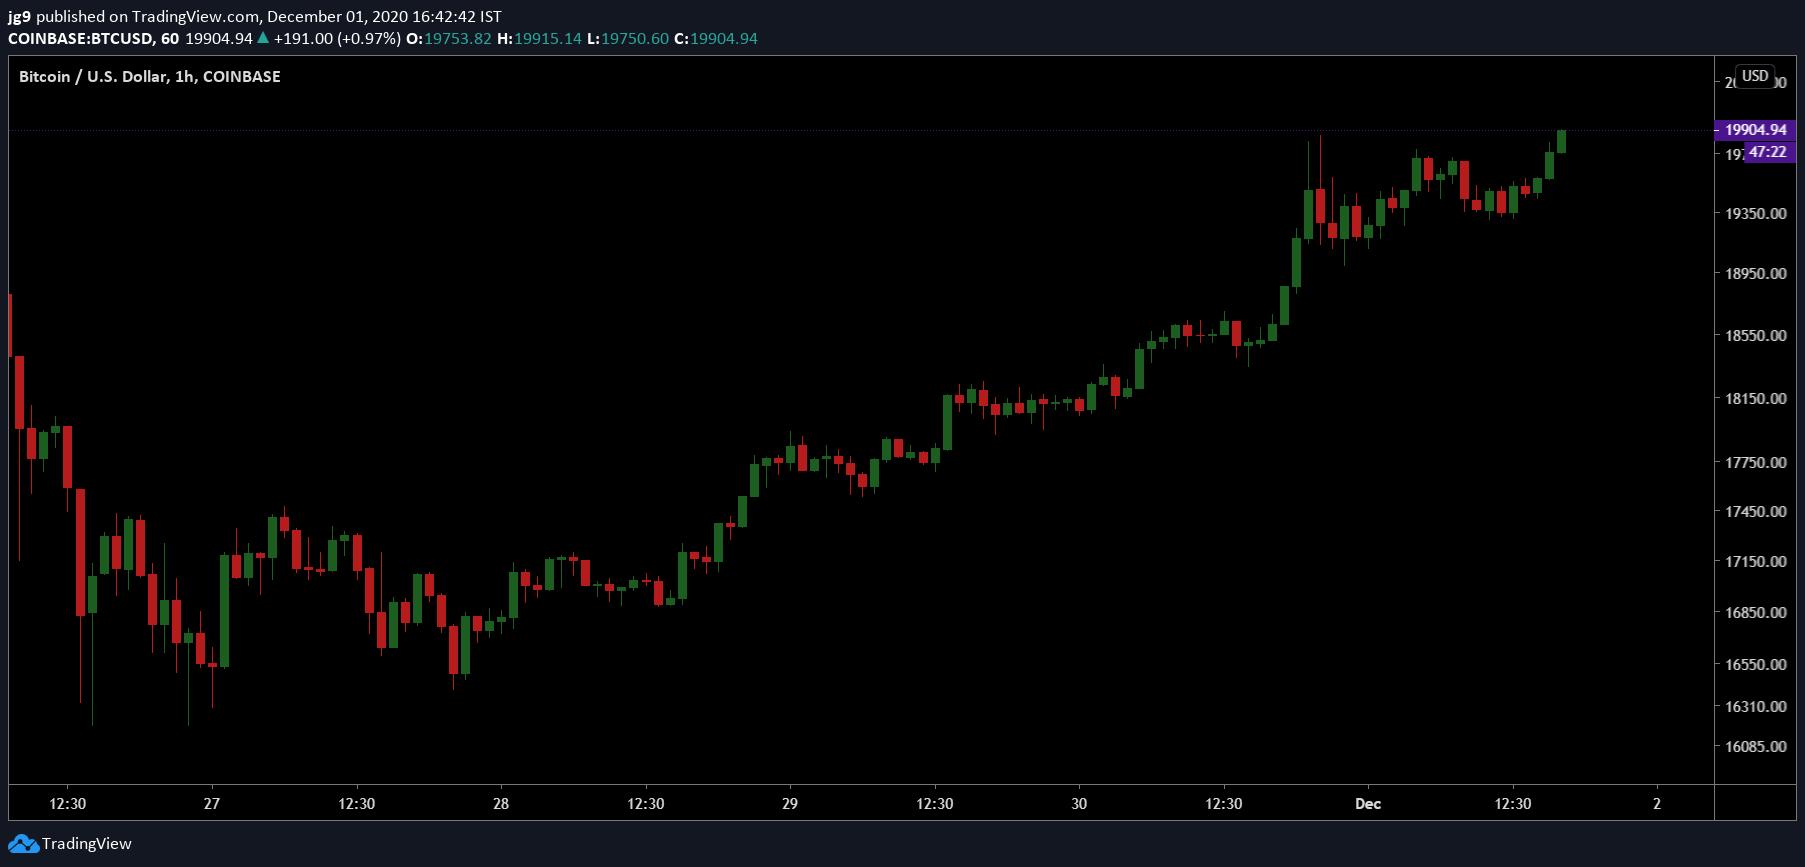 Coinbase records new Bitcoin ATH at $19,900 1